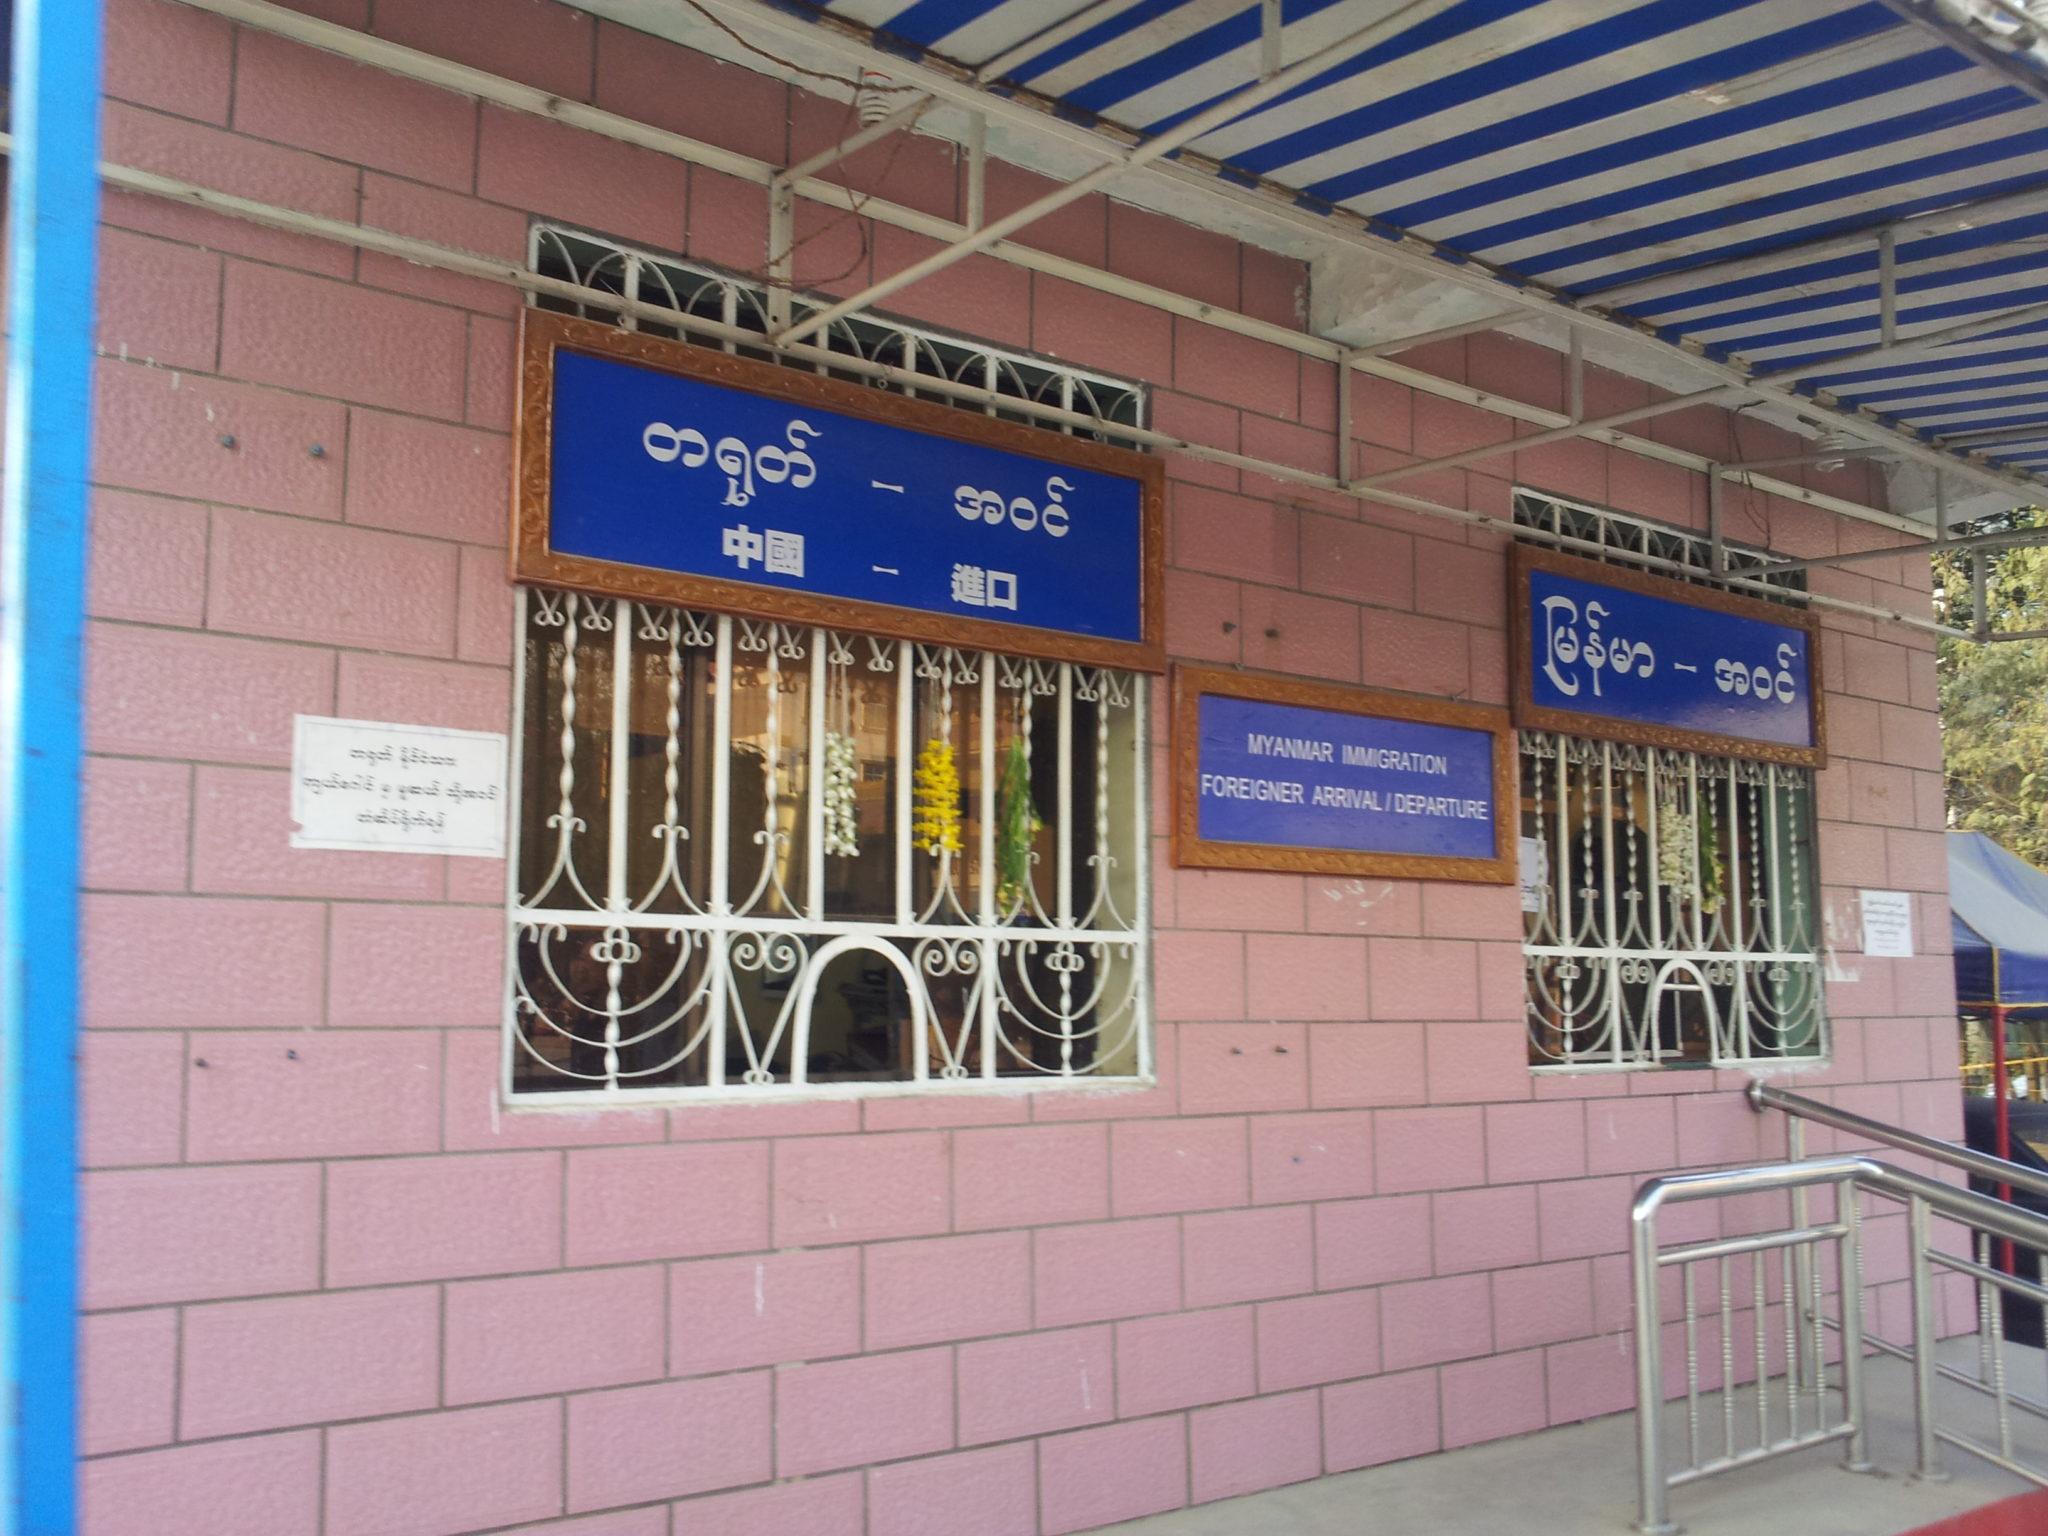 Multilingualism at the China-Myanmar border